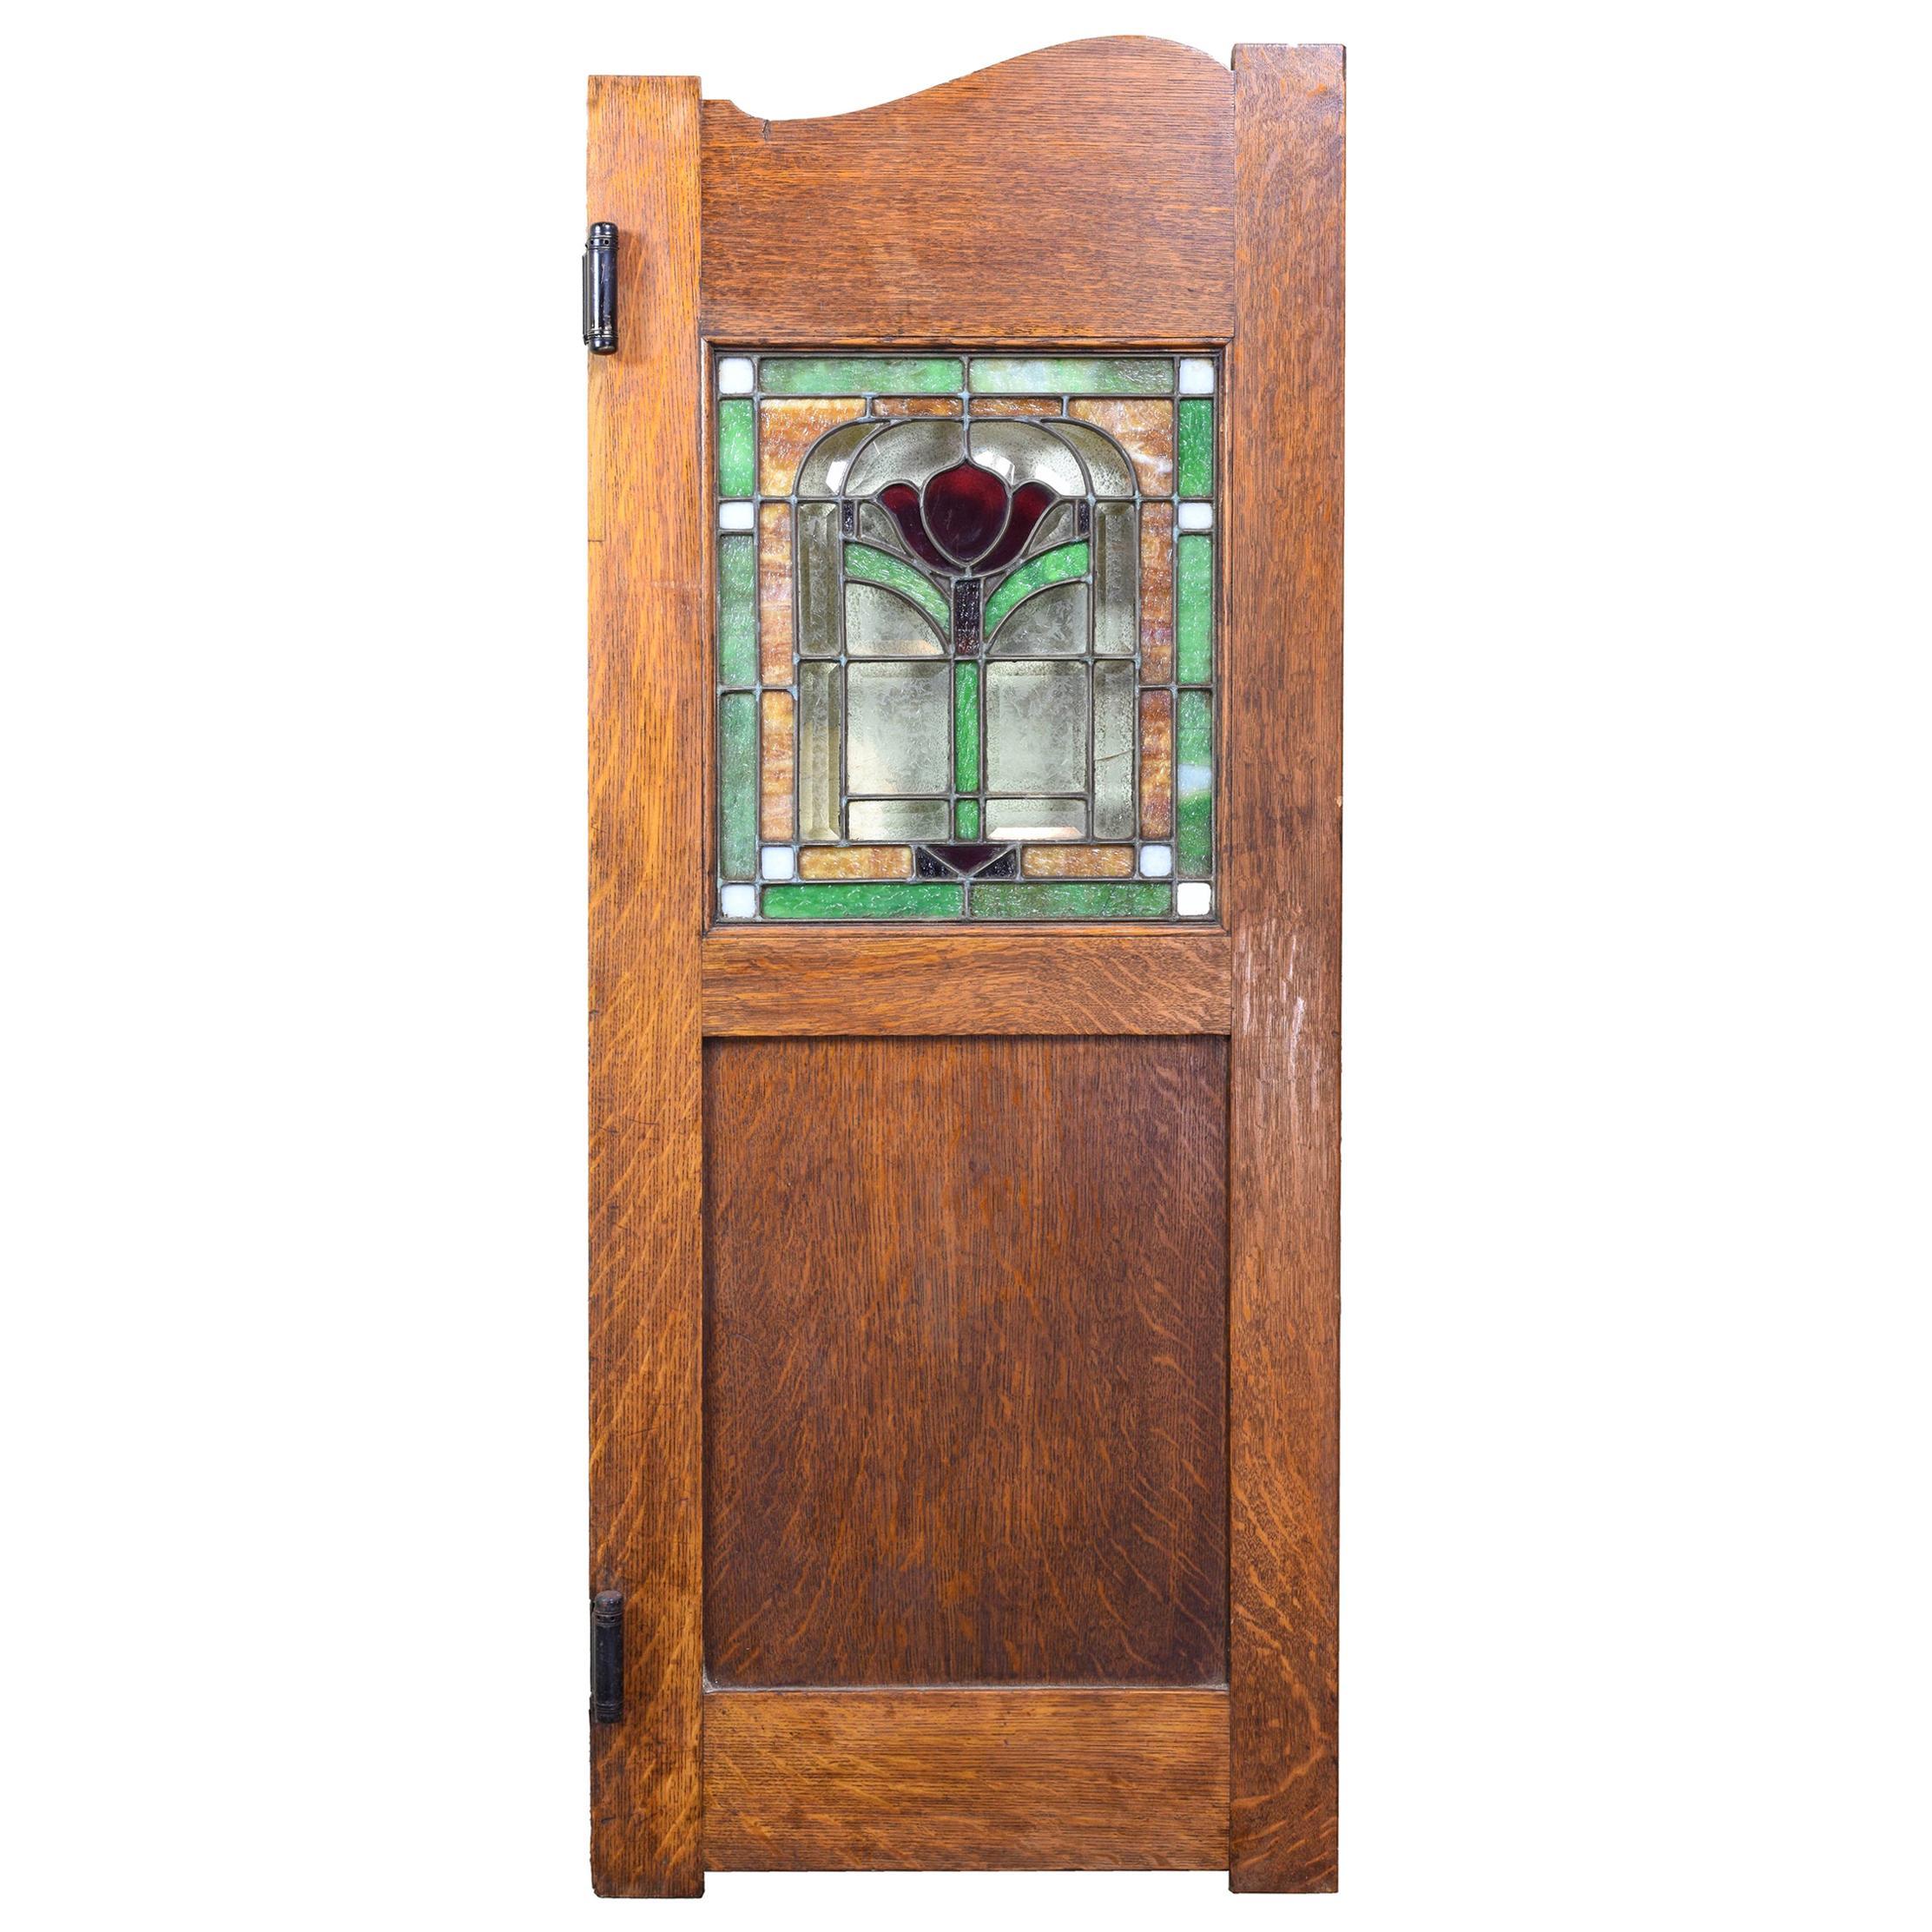 Stained Glass Swinging Tiger Oak Pub Door